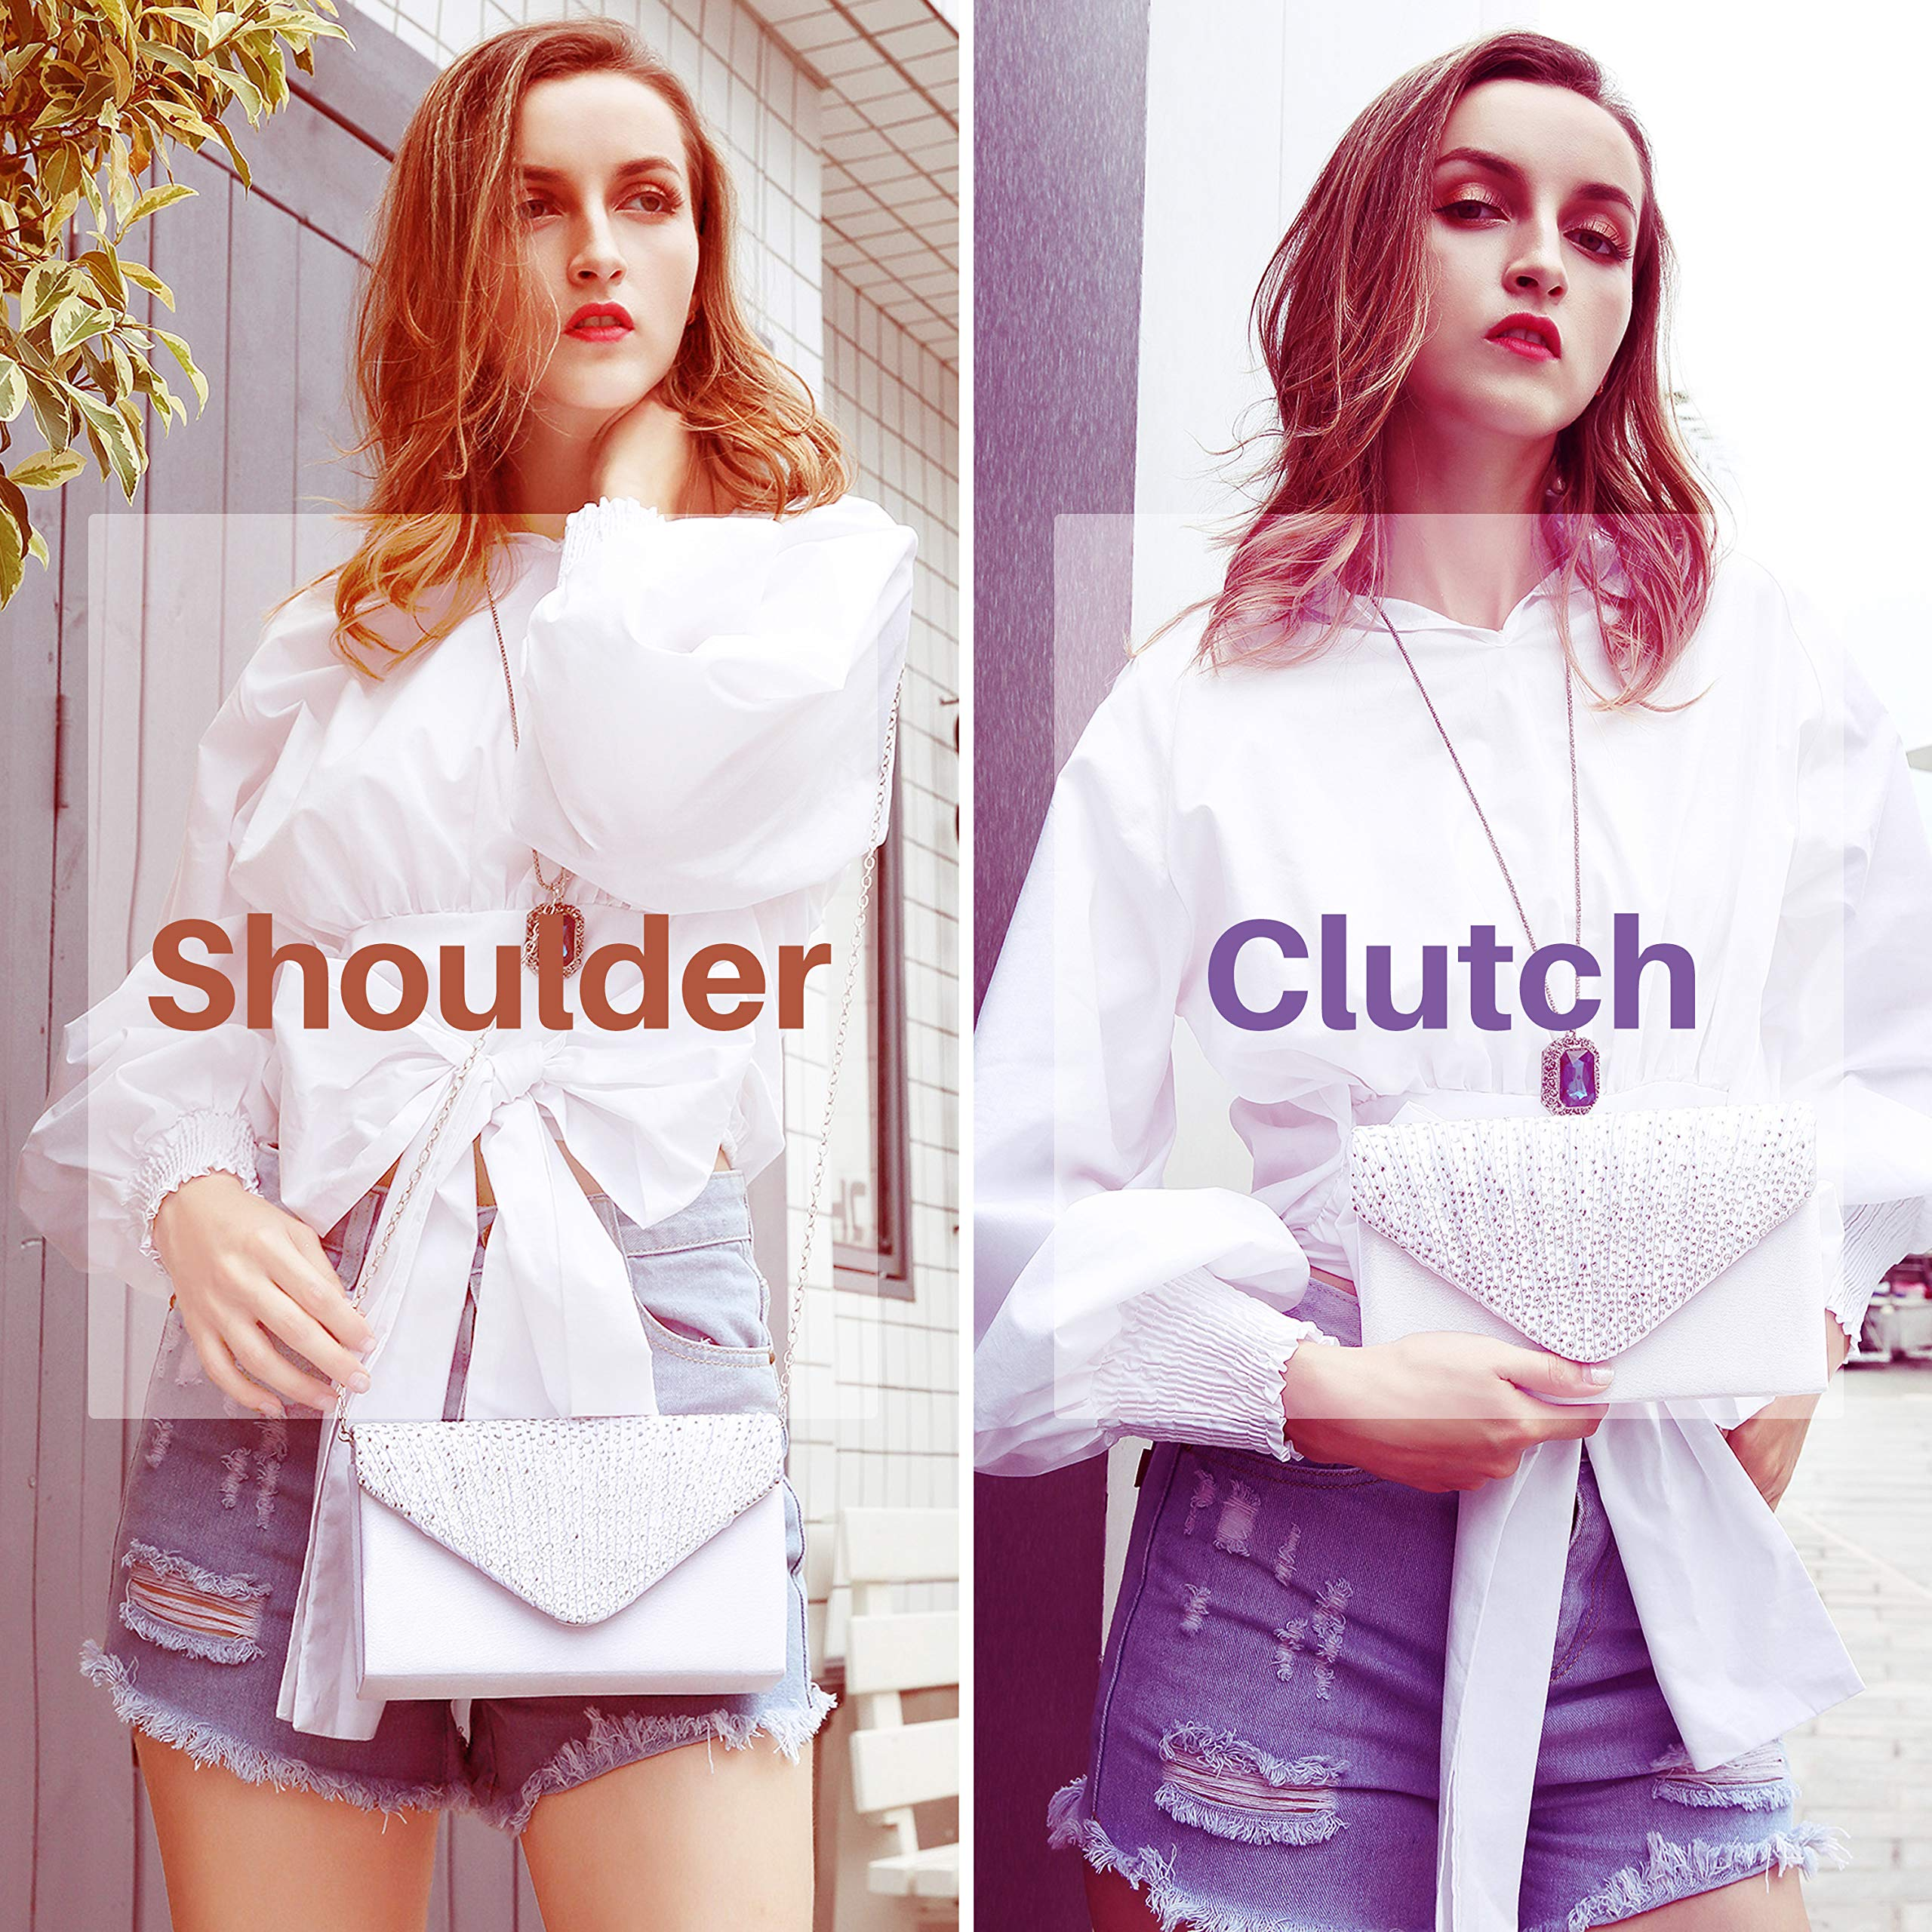 Milisente Clutch Purses for Women evening Glitter Wedding Purse Crystal Envelope Clutches Shoulder Bags (White) by Milisente (Image #2)